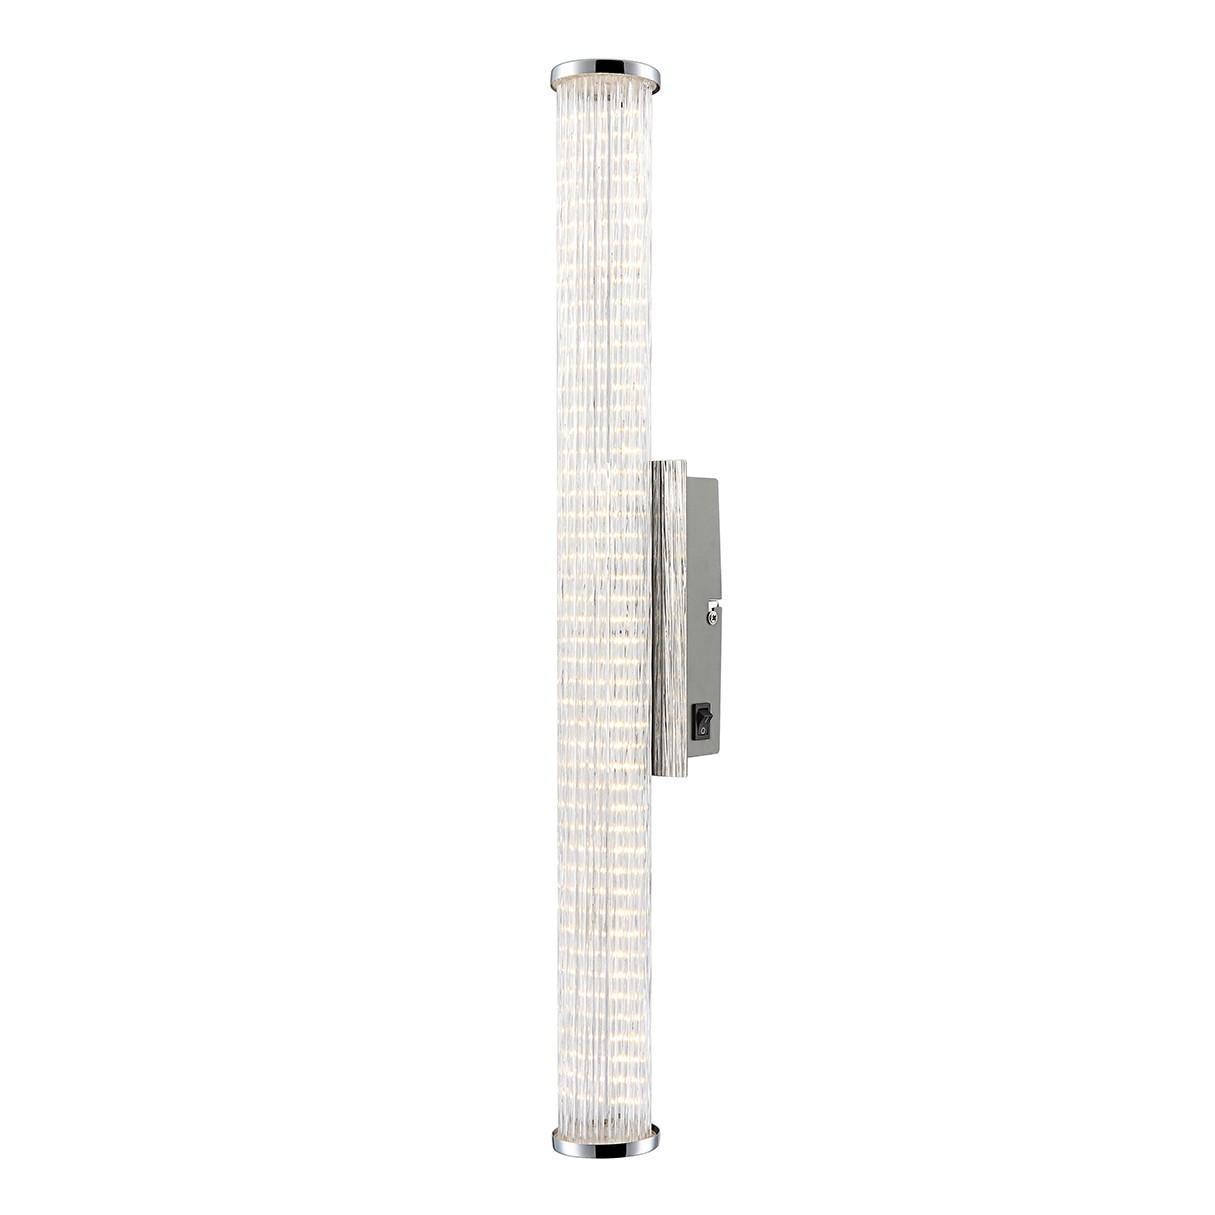 LED-Wandleuchte Stretch III 1-flammig